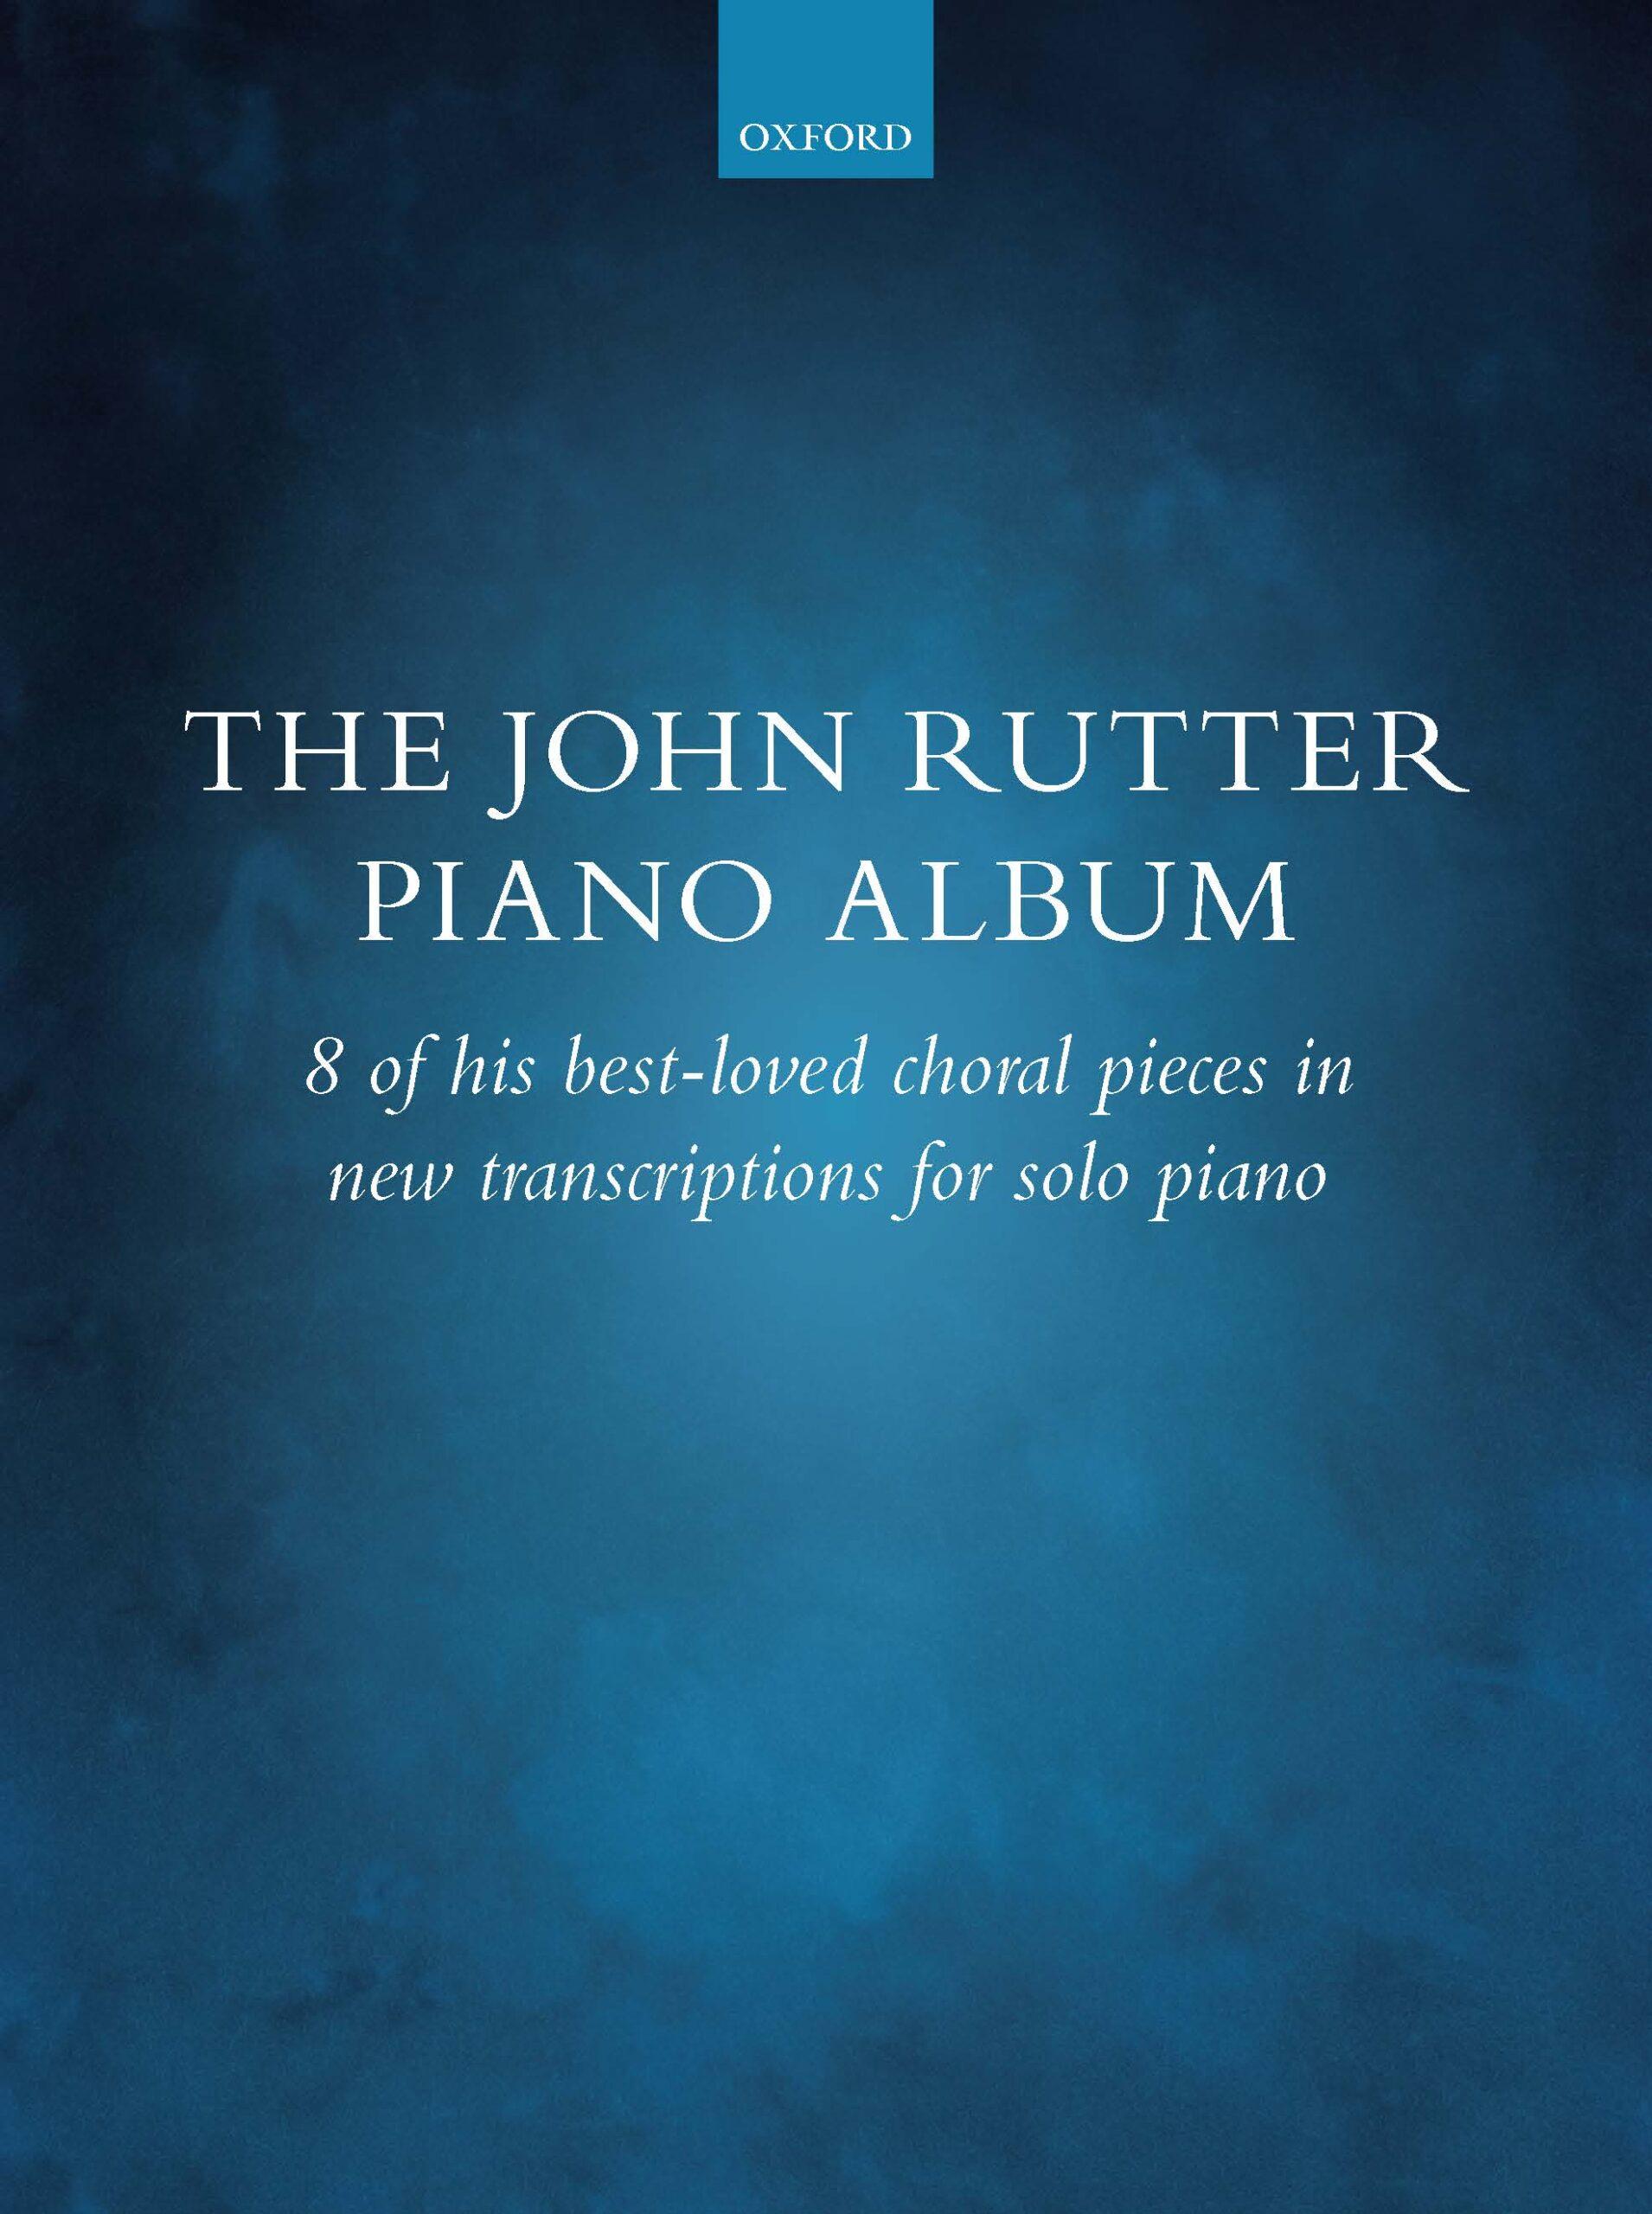 The John Rutter Piano Album Published